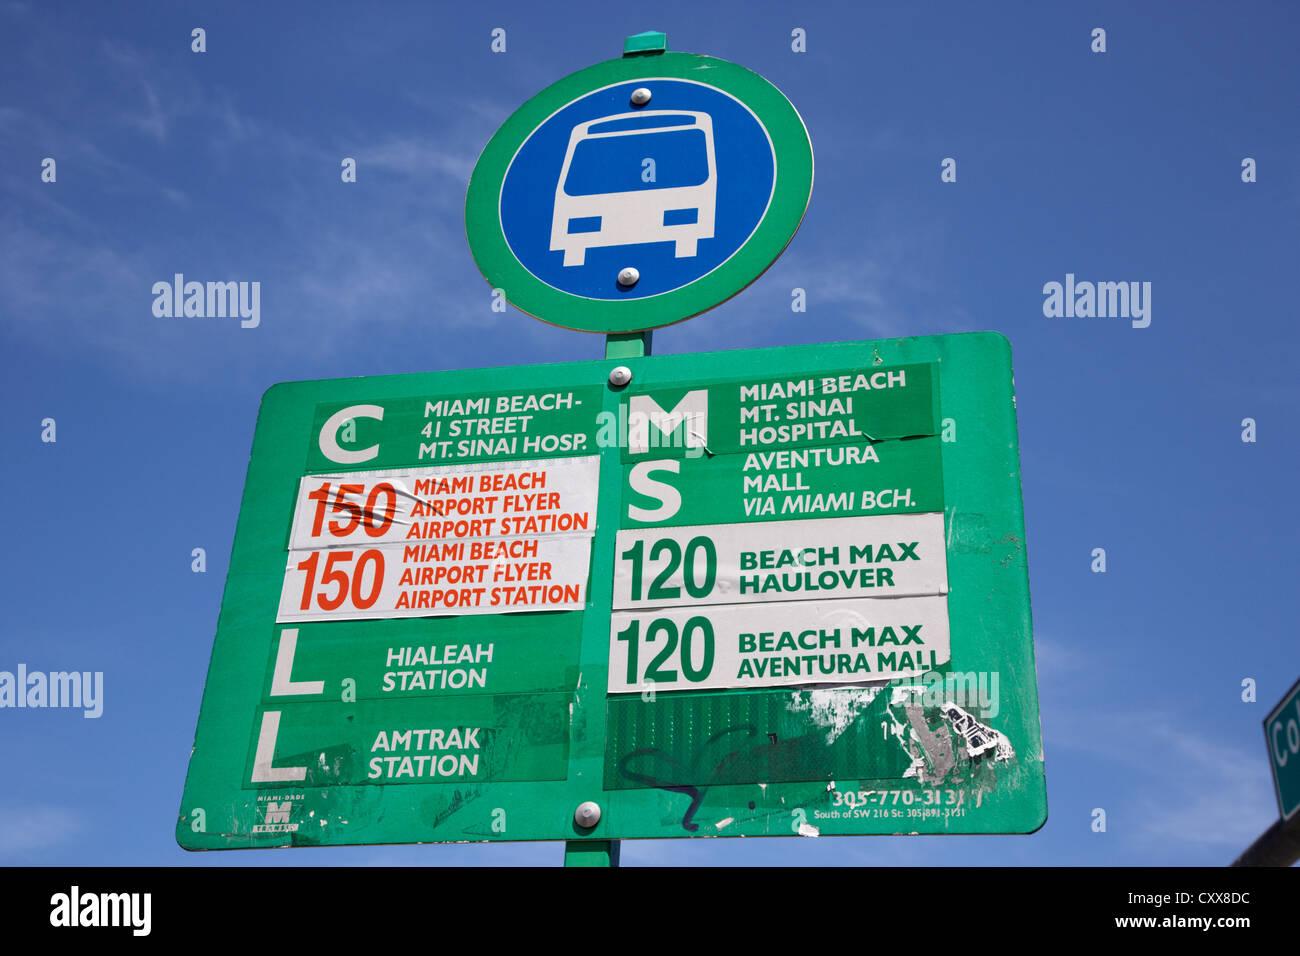 miami-dade public bus transport stop miami south beach florida usa - Stock Image